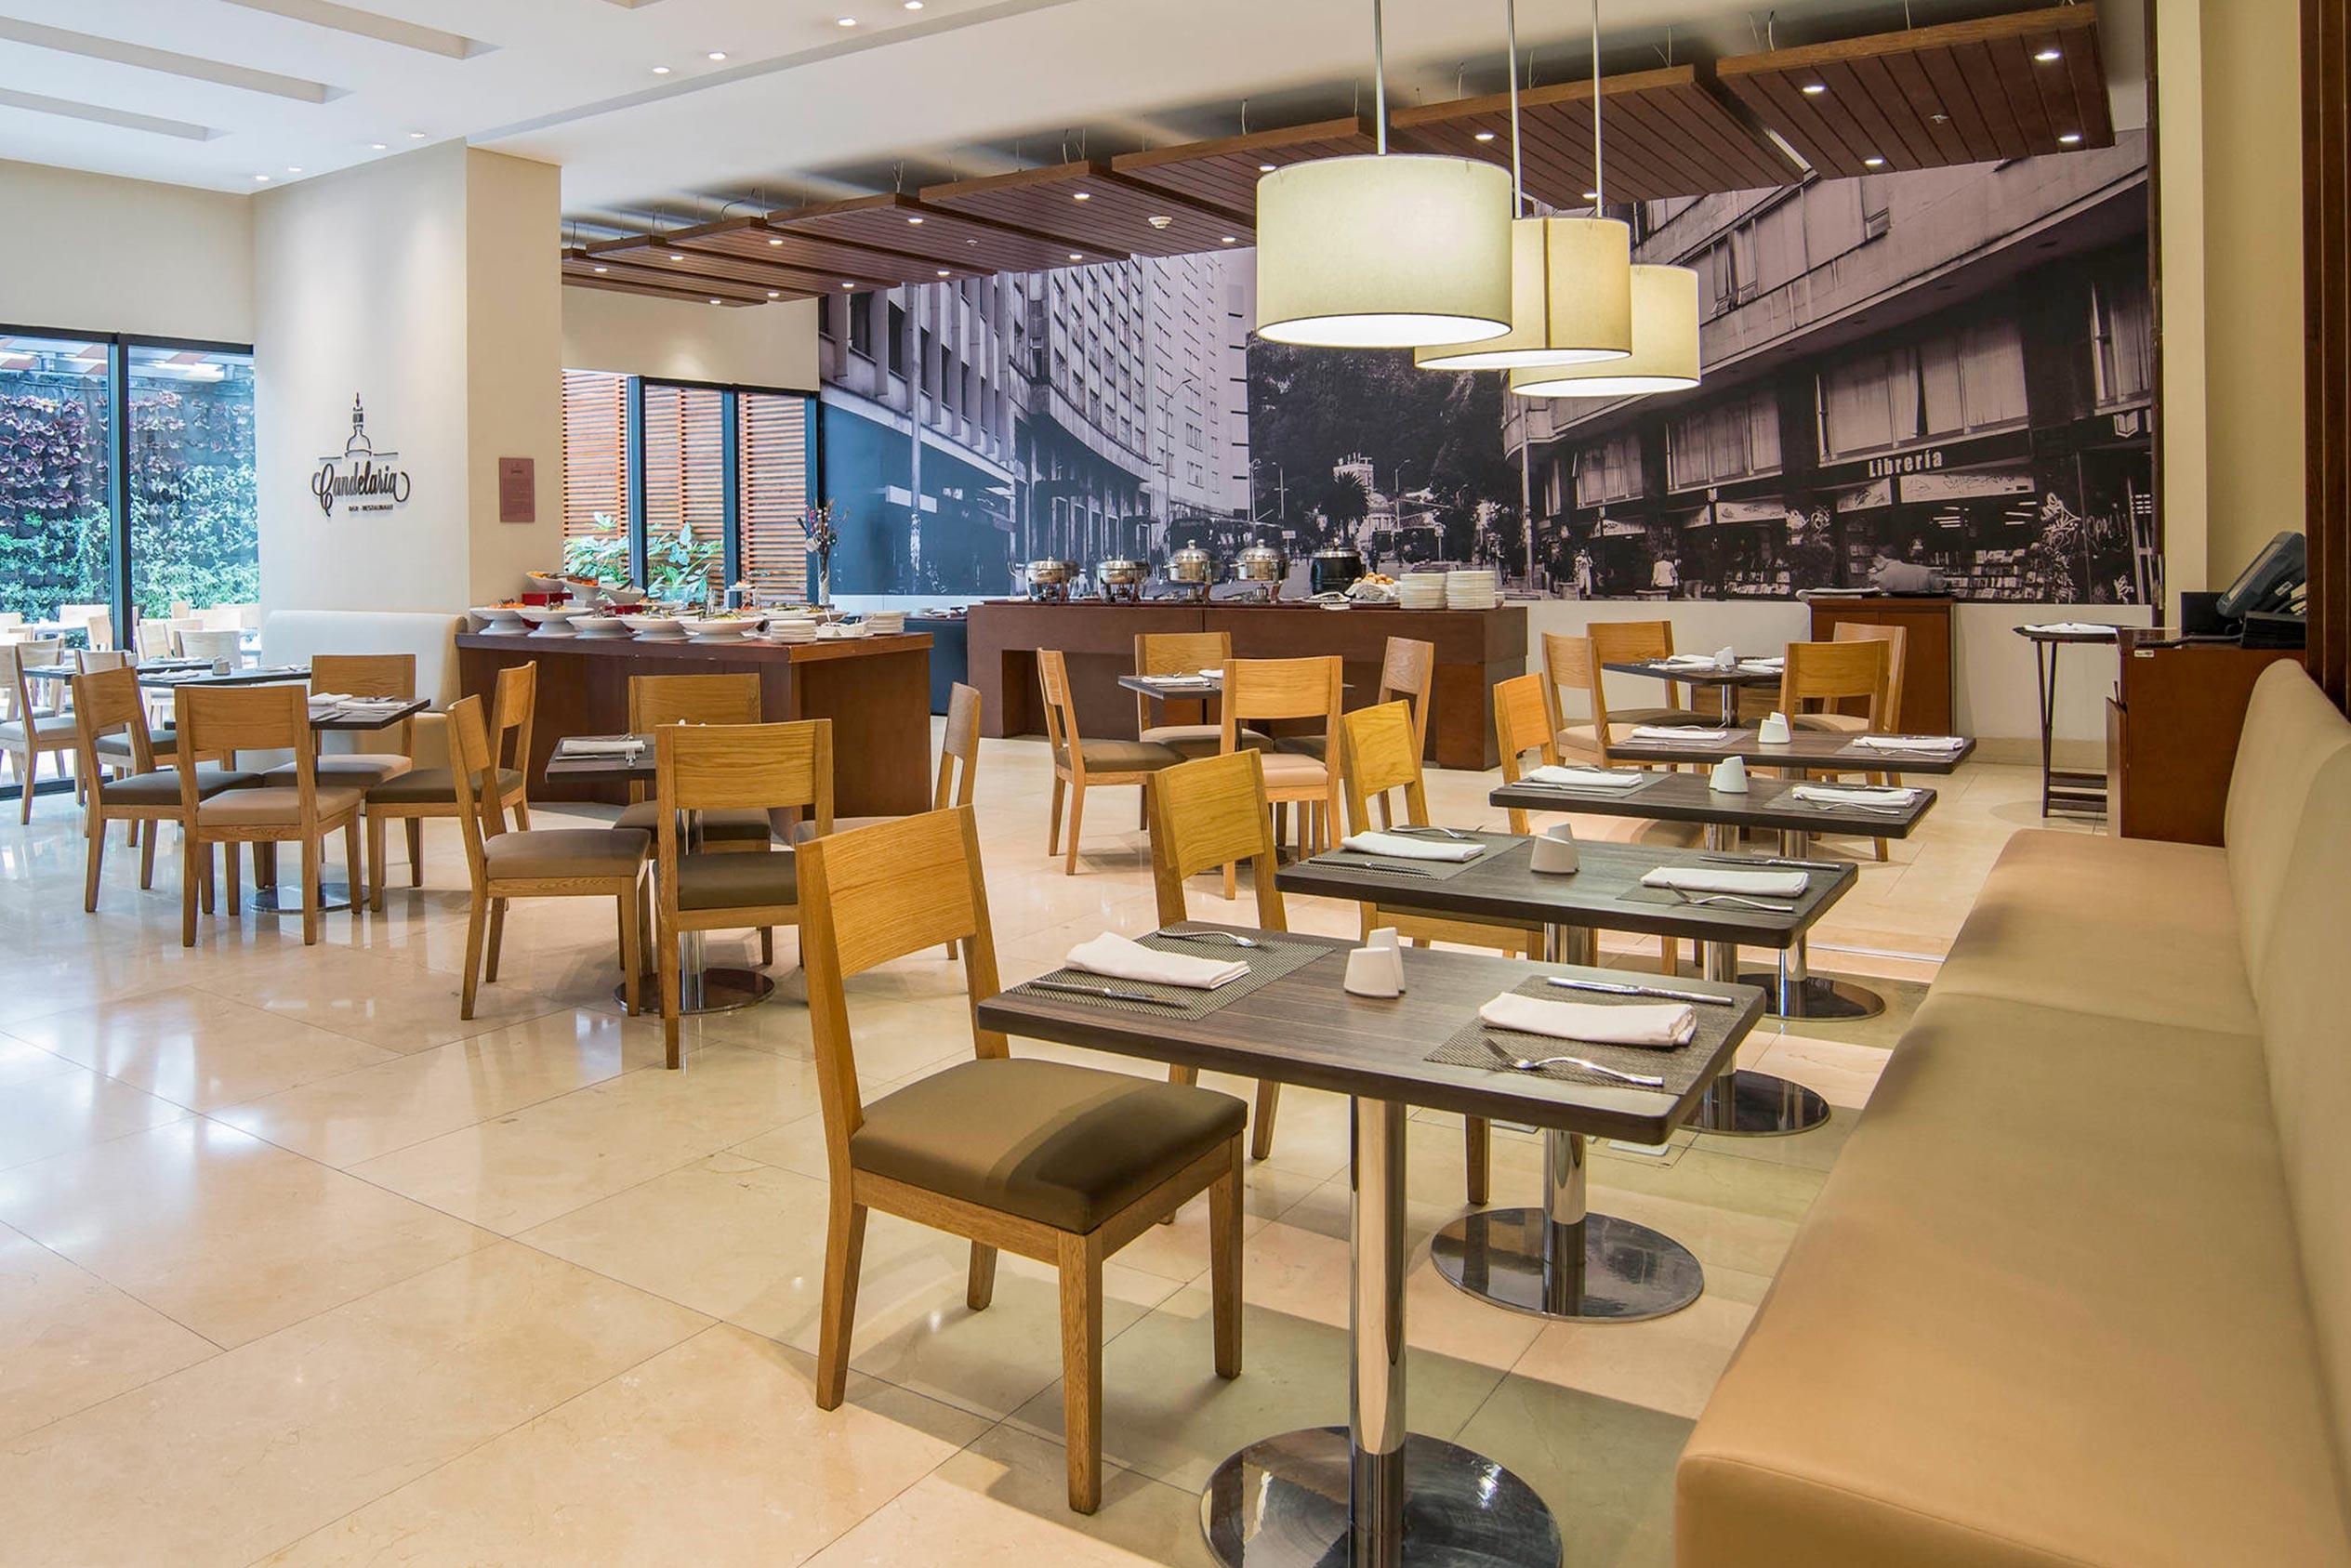 Comedor Hotel Mercure Bogotá 100